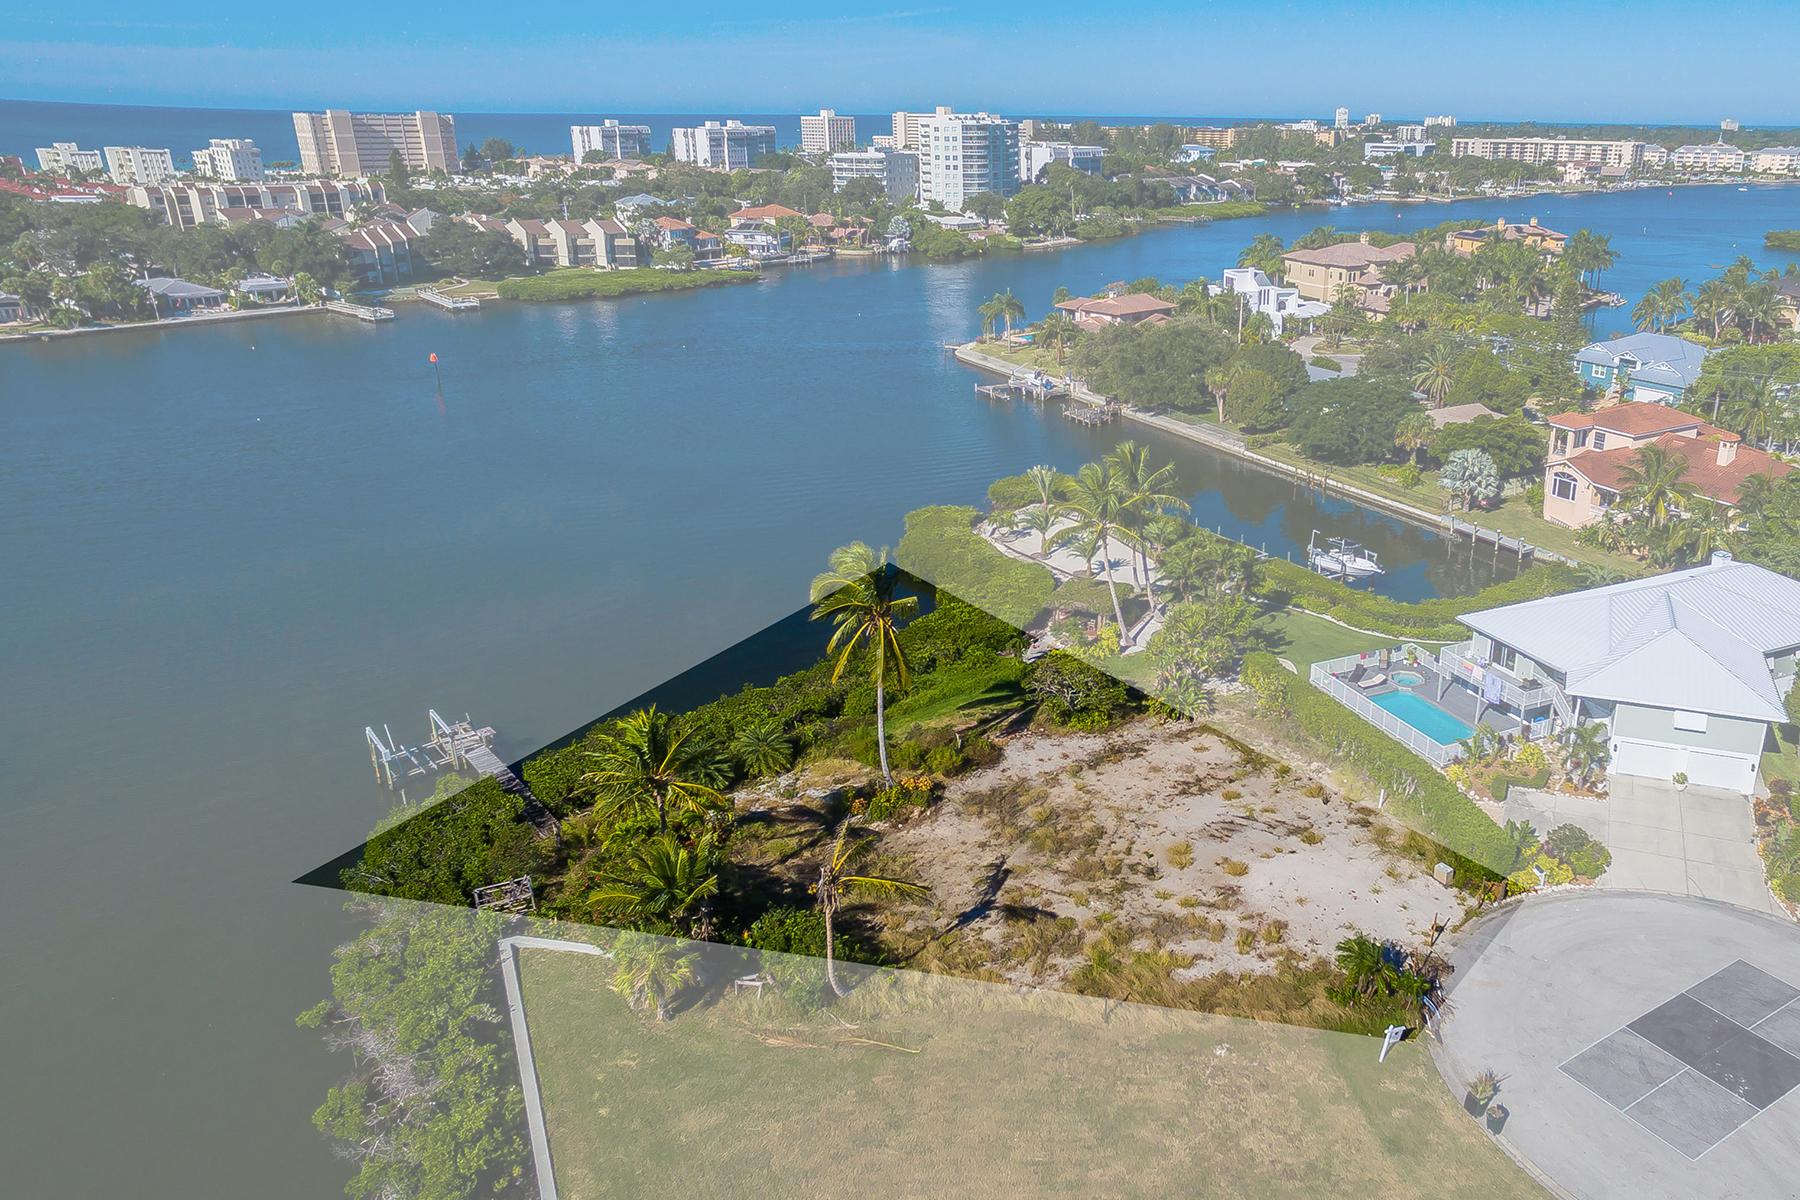 Terrain pour l Vente à BAYWINDS ESTATE 1604 Baywinds Ln 13 Sarasota, Florida, 34231 États-Unis